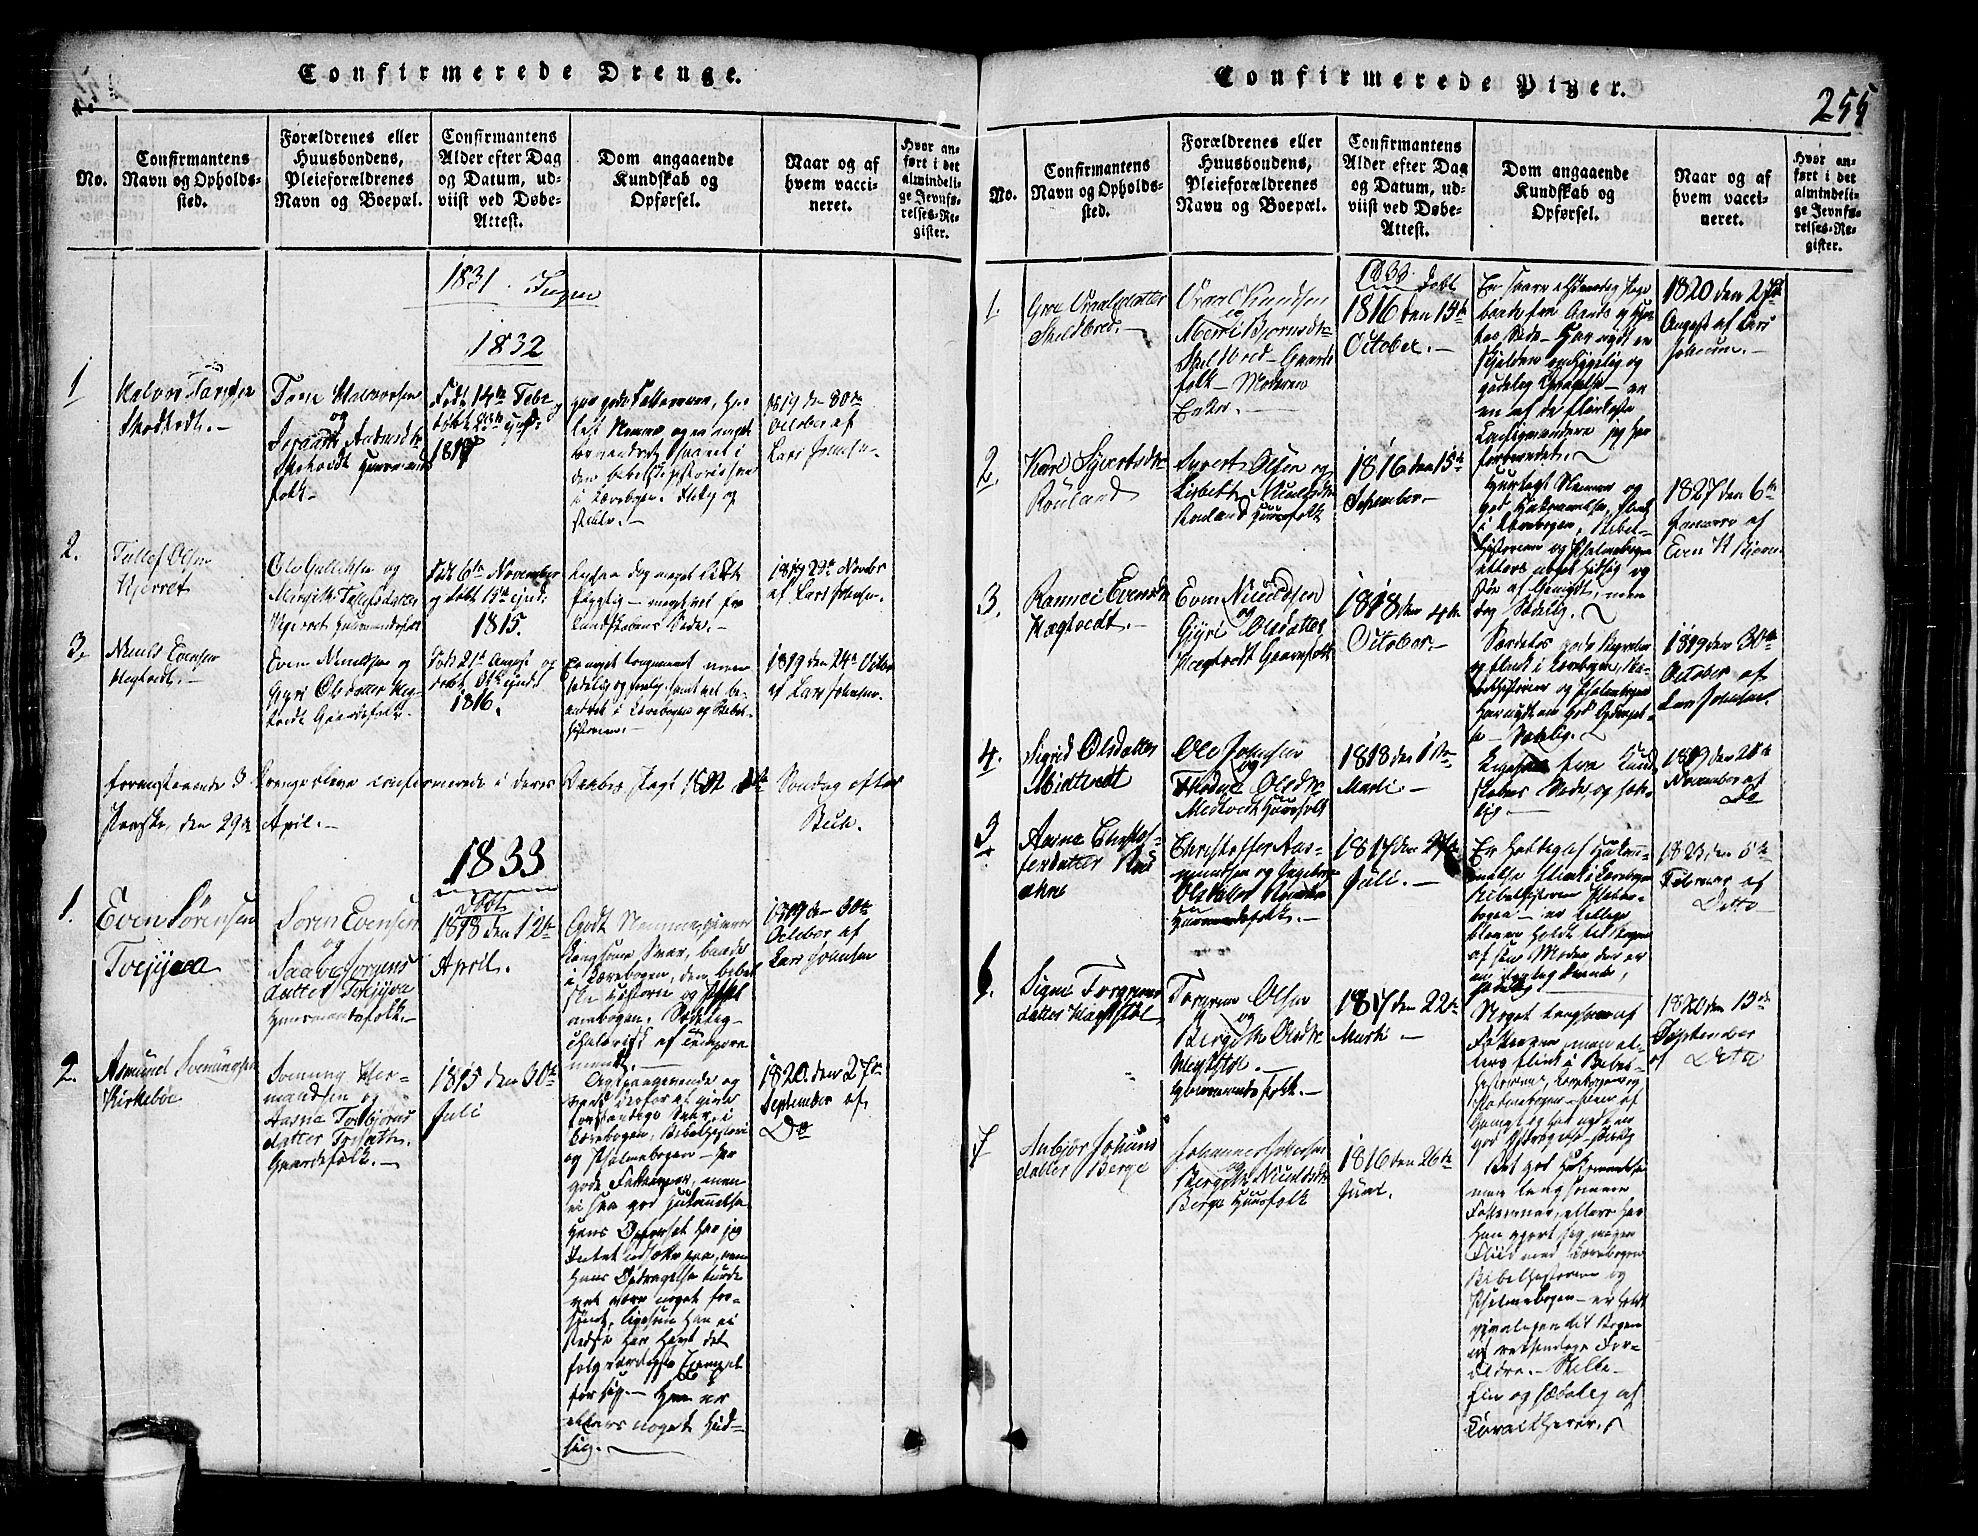 SAKO, Lårdal kirkebøker, G/Ga/L0001: Klokkerbok nr. I 1, 1815-1861, s. 255